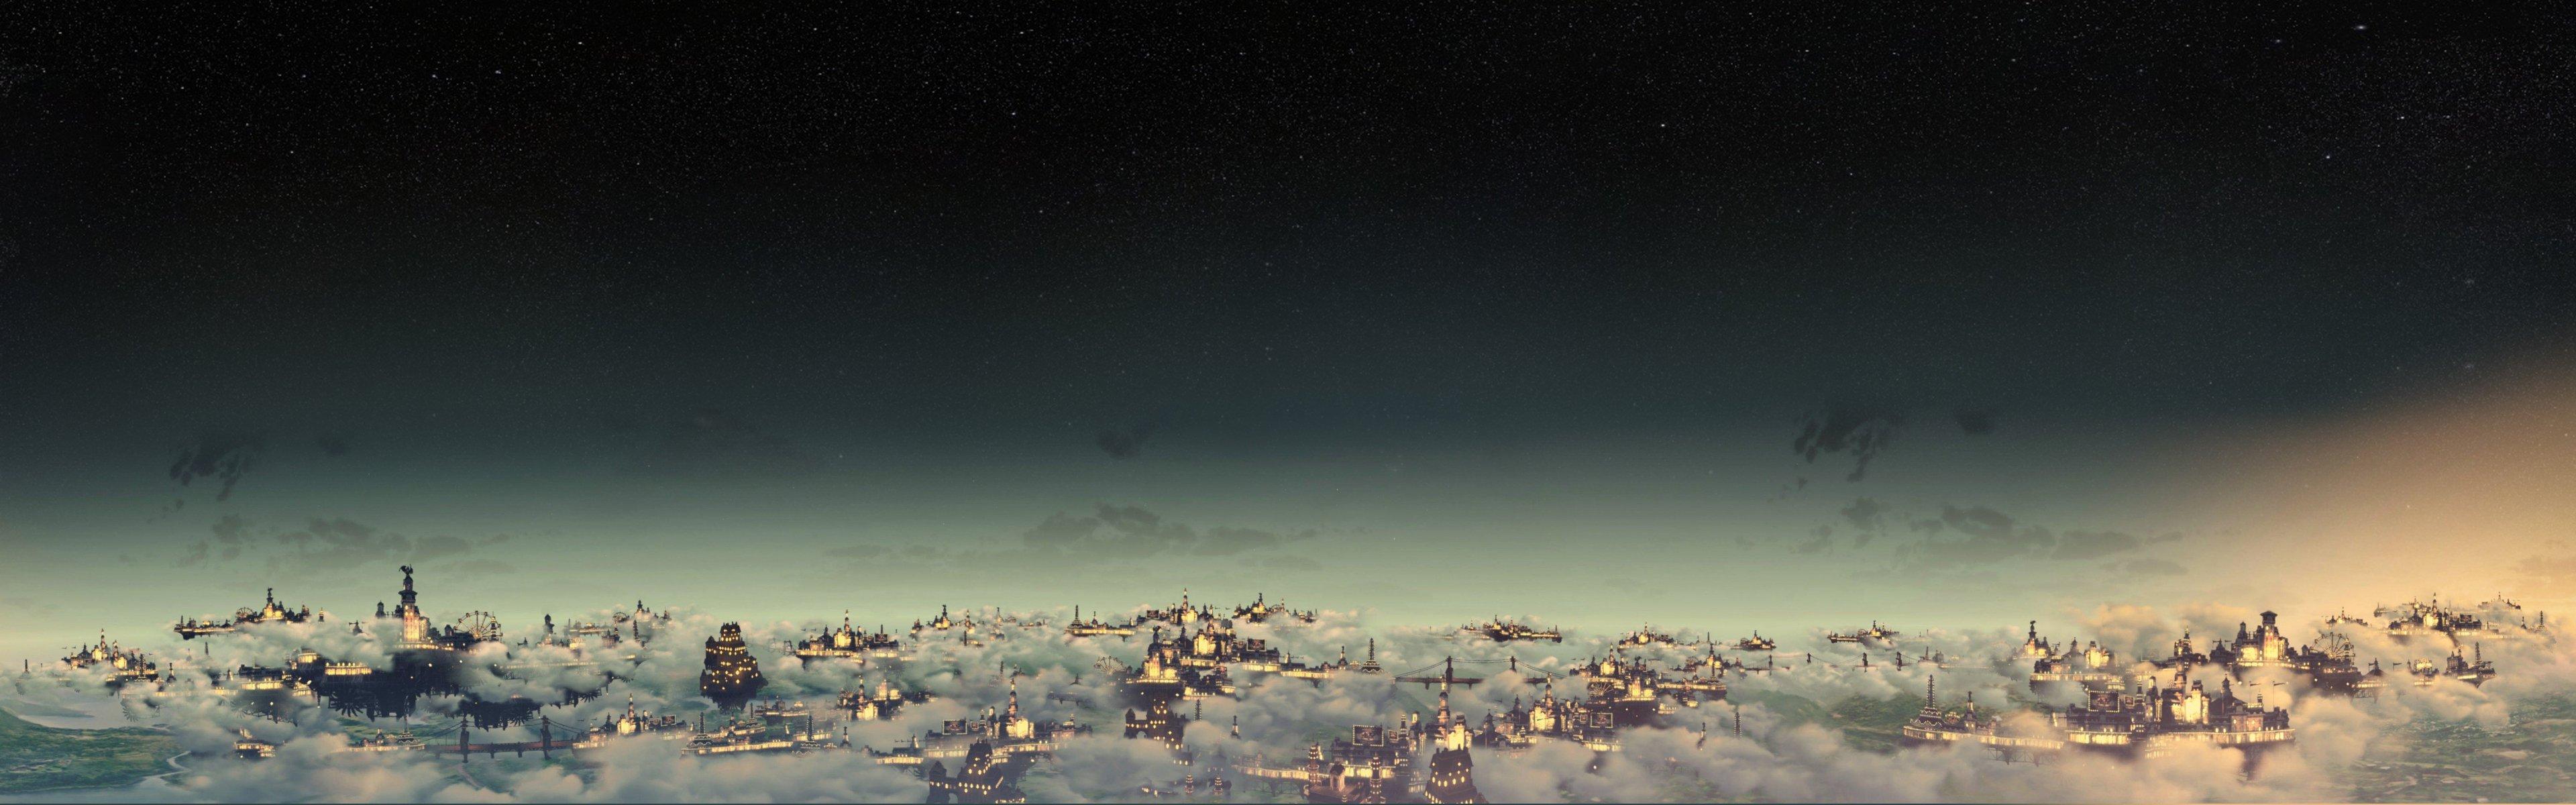 Star Wars Panorama